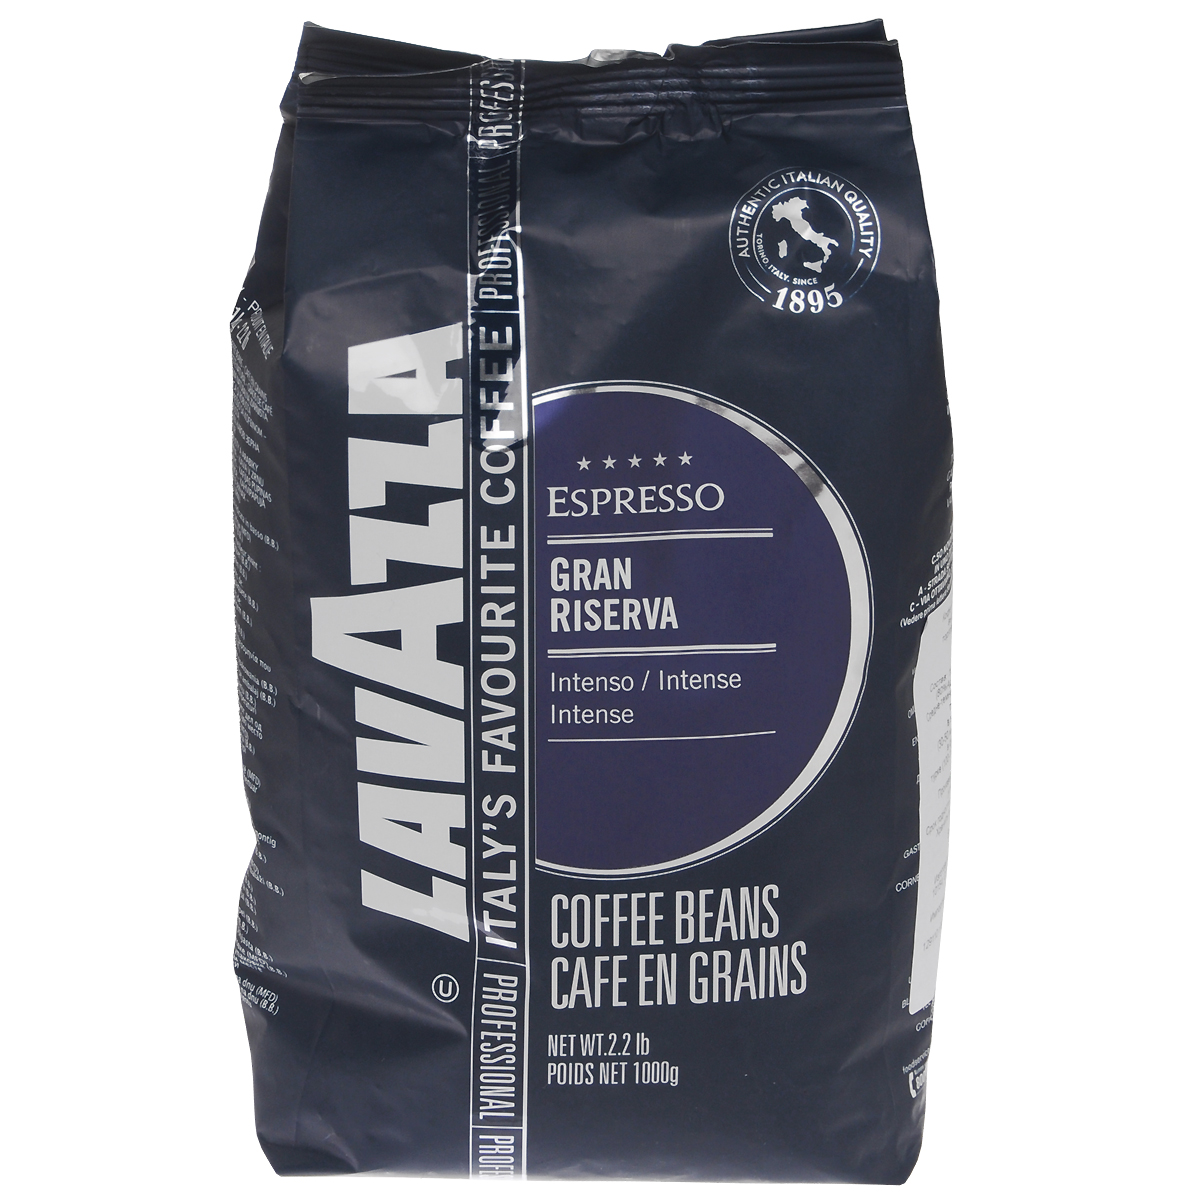 Lavazza Gran Riserva кофе в зернах, 1 кг кофе в зернах lavazza 3590 rossa 1кг